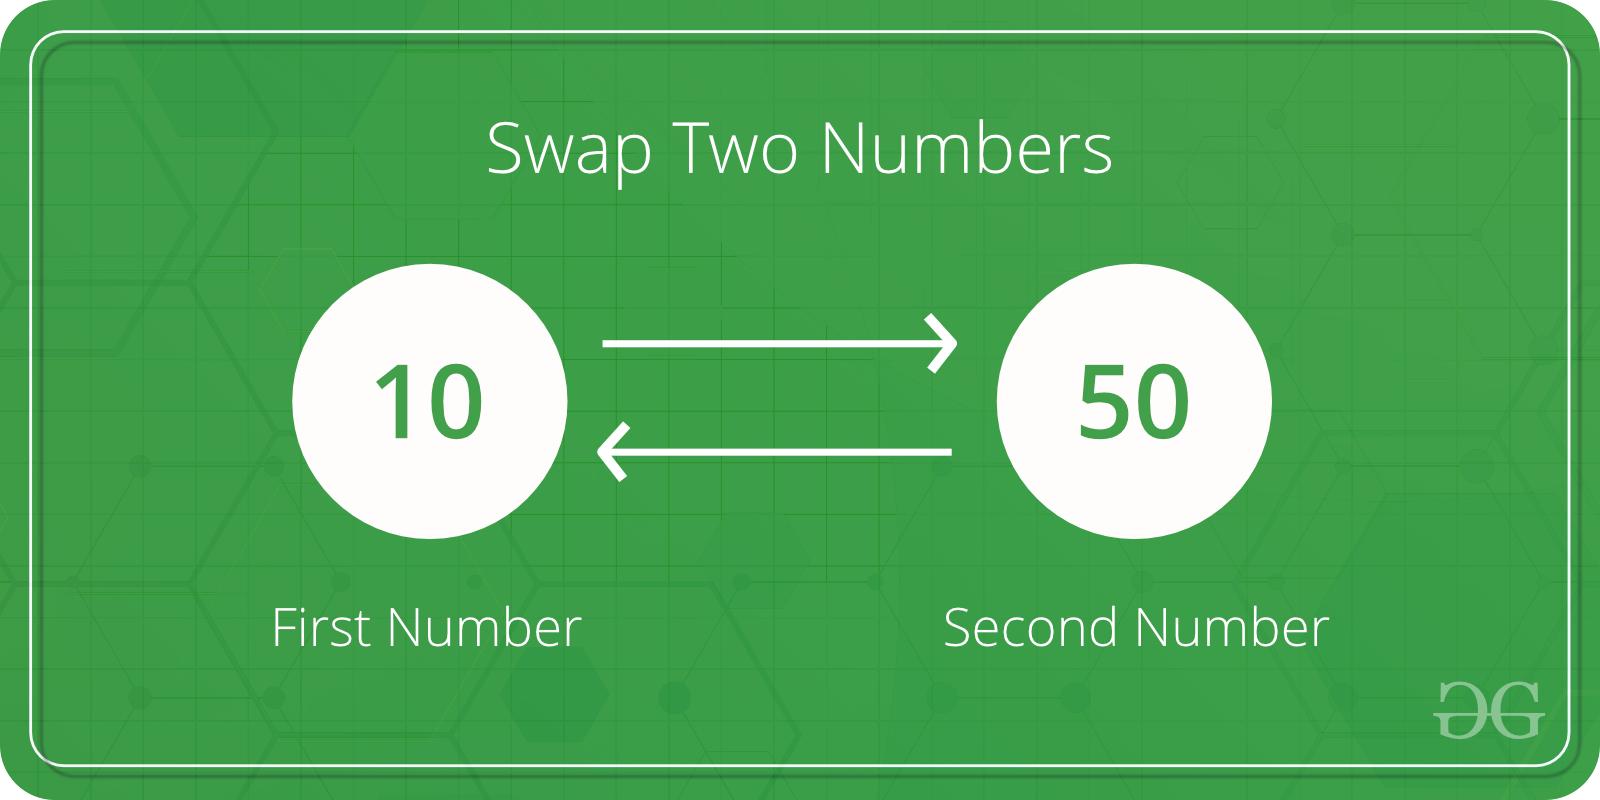 Swap - what is it in simple words